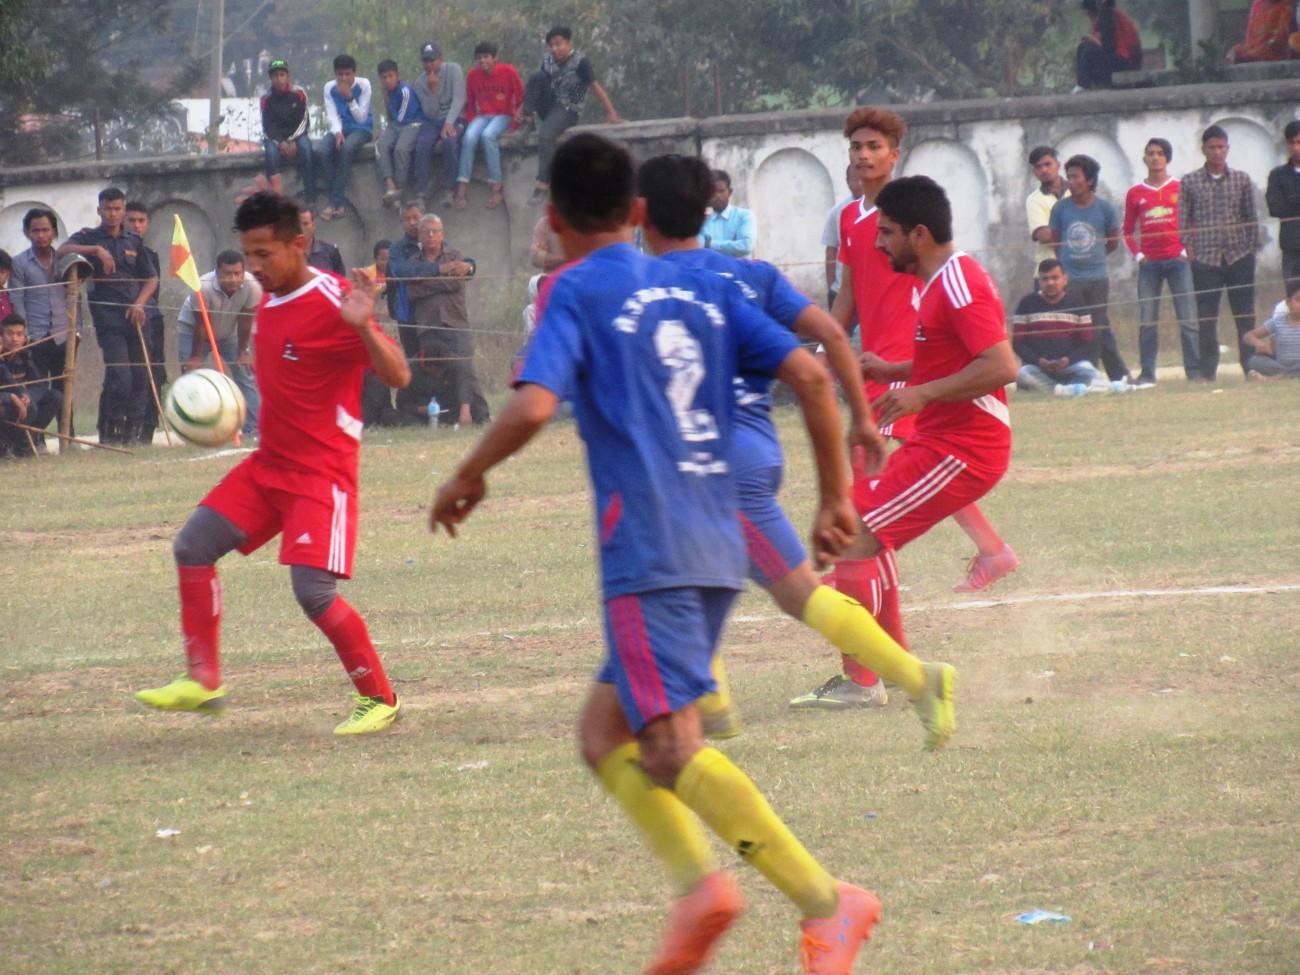 Football-1520687182.jpg